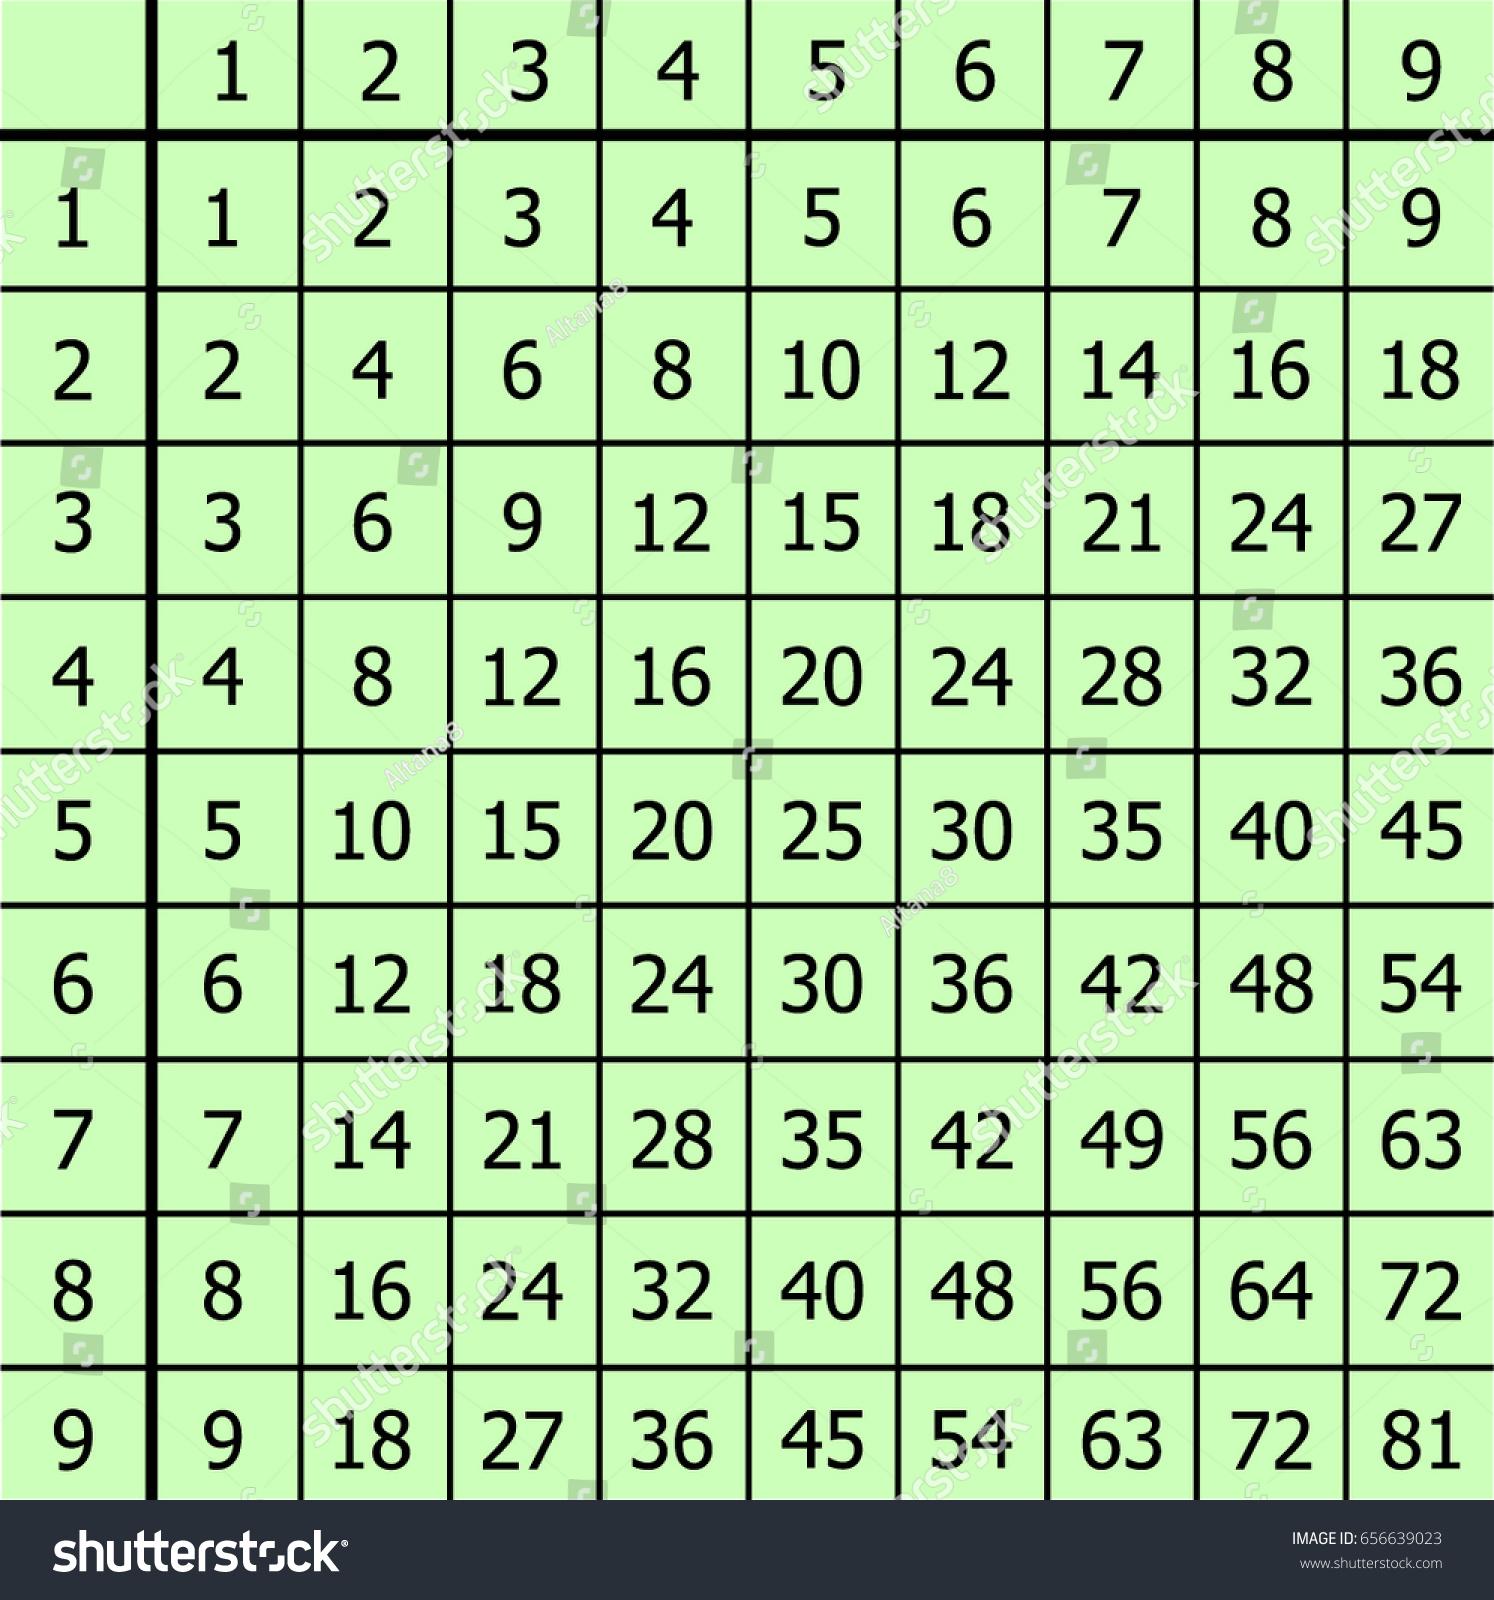 Multiplication Table Vector Icon Stock Vector 656639023 - Shutterstock